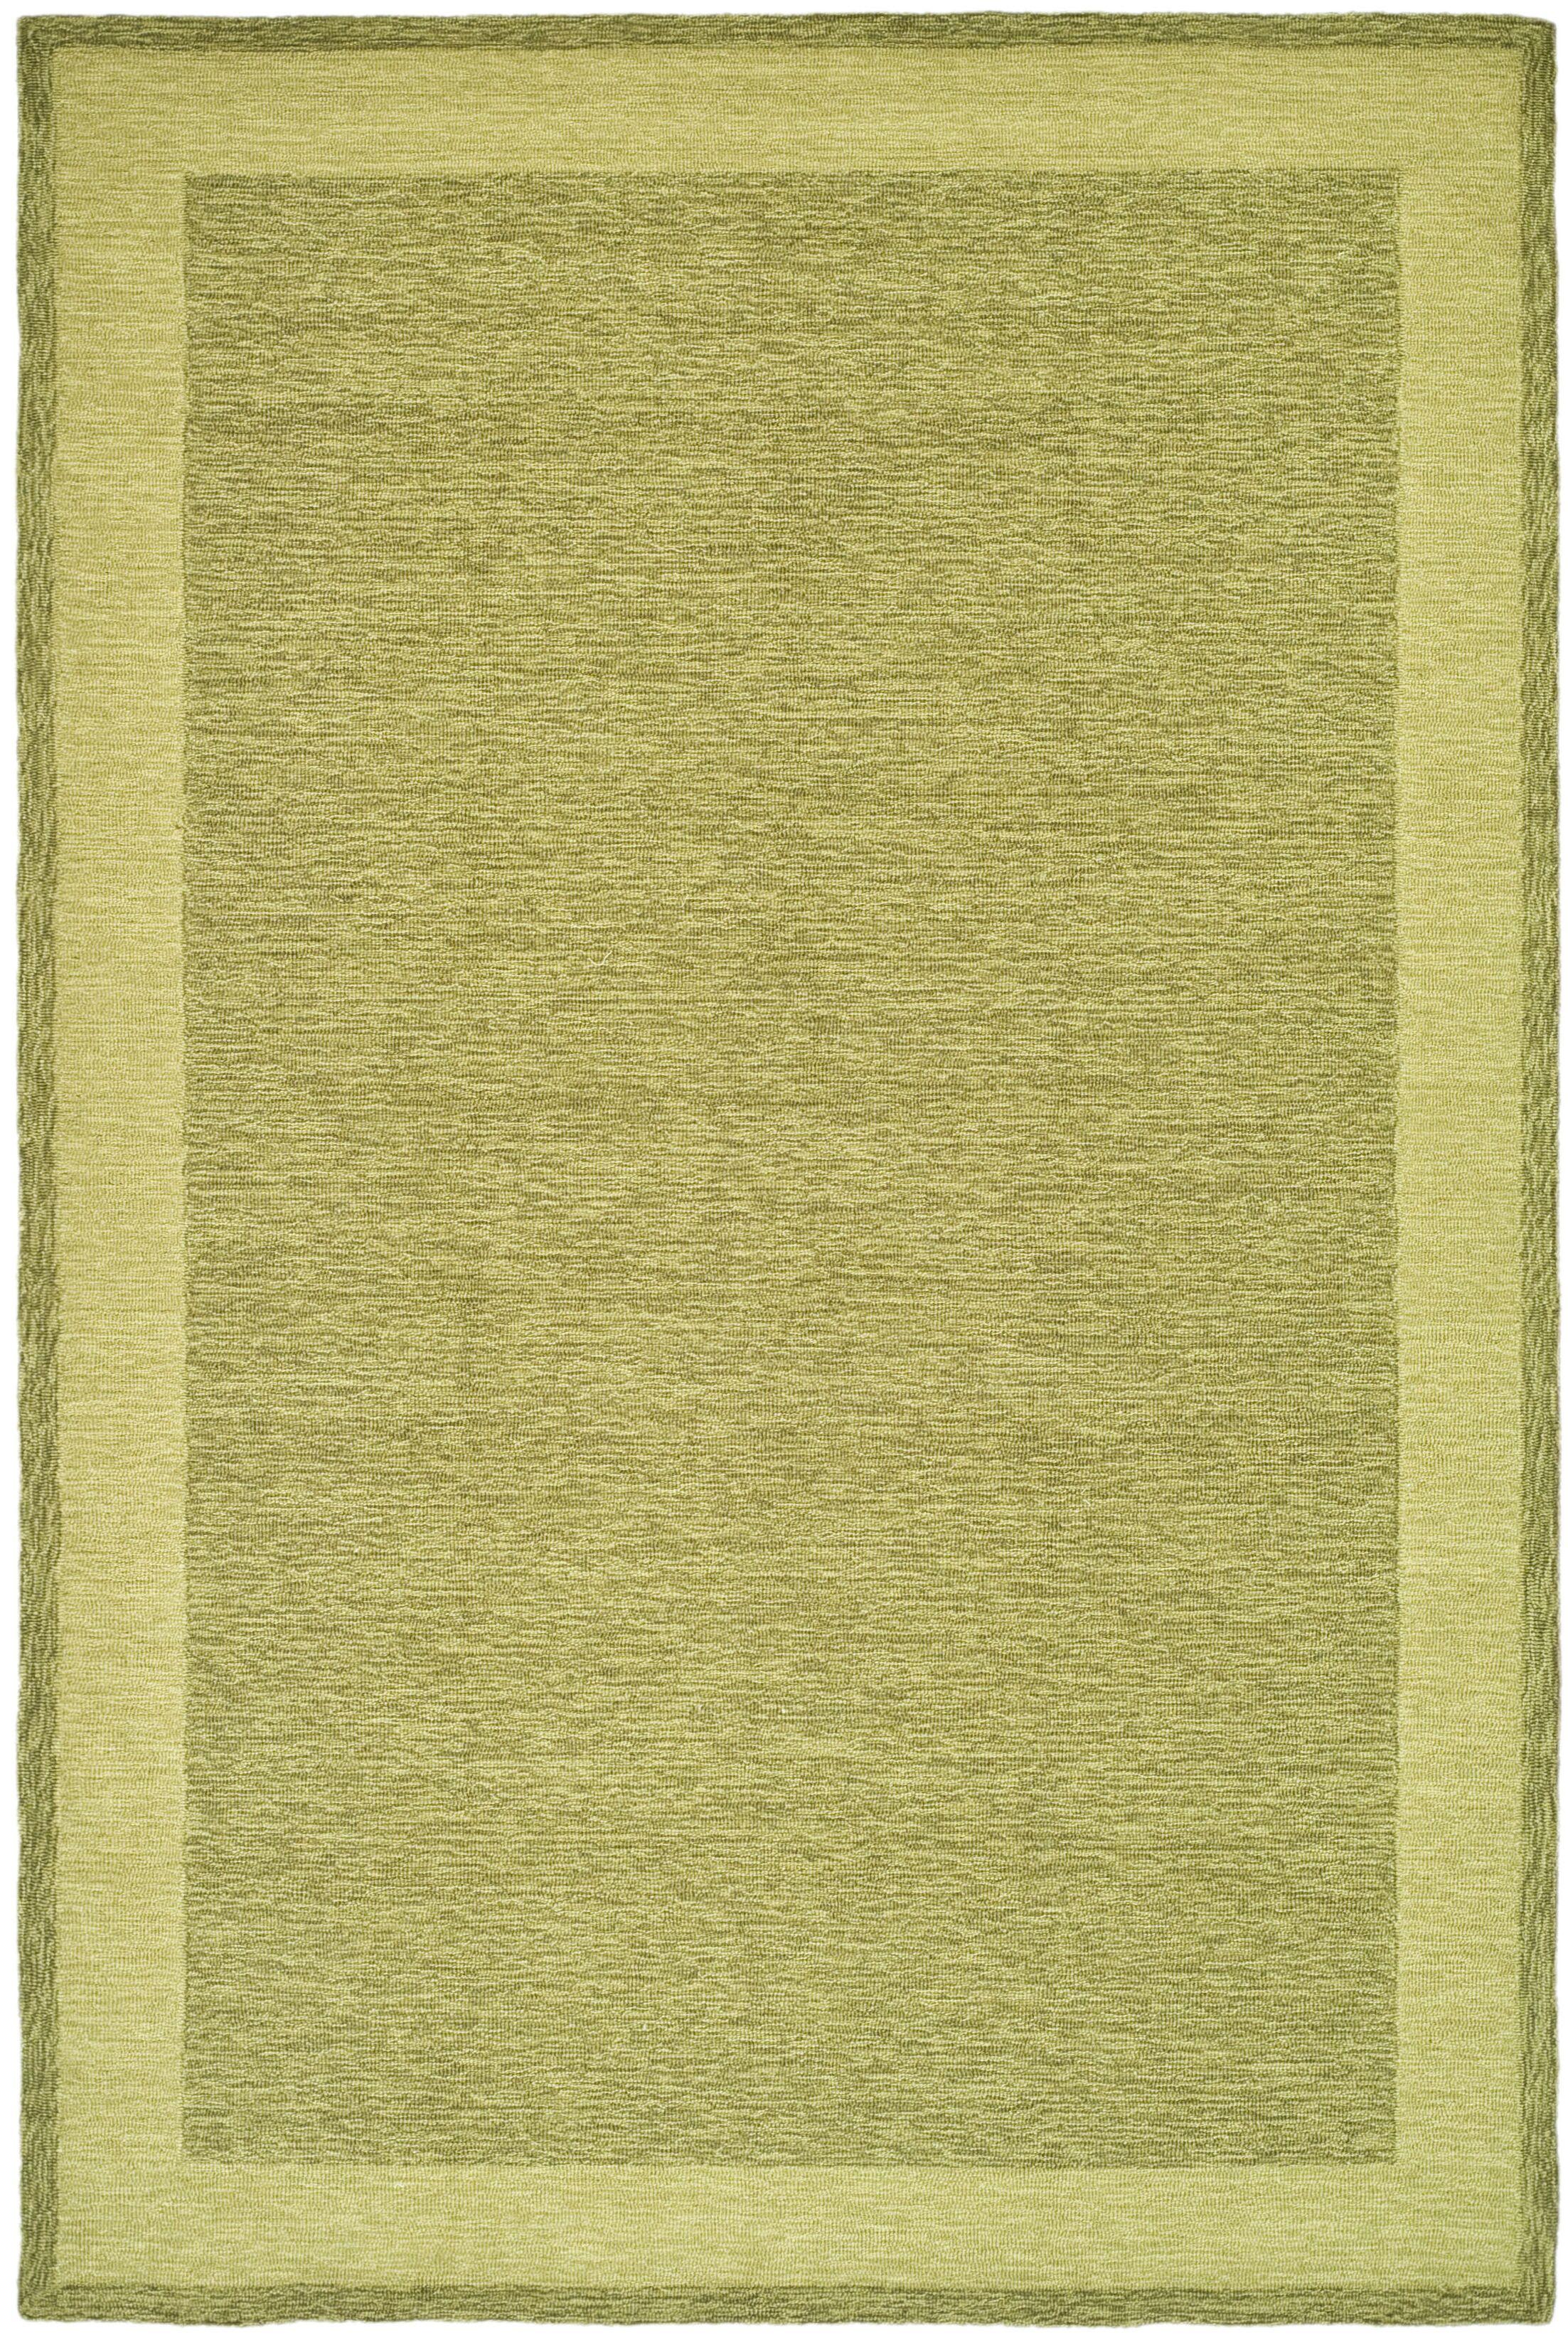 DuraRug Green Area Rug Rug Size: Rectangle 3' x 5'